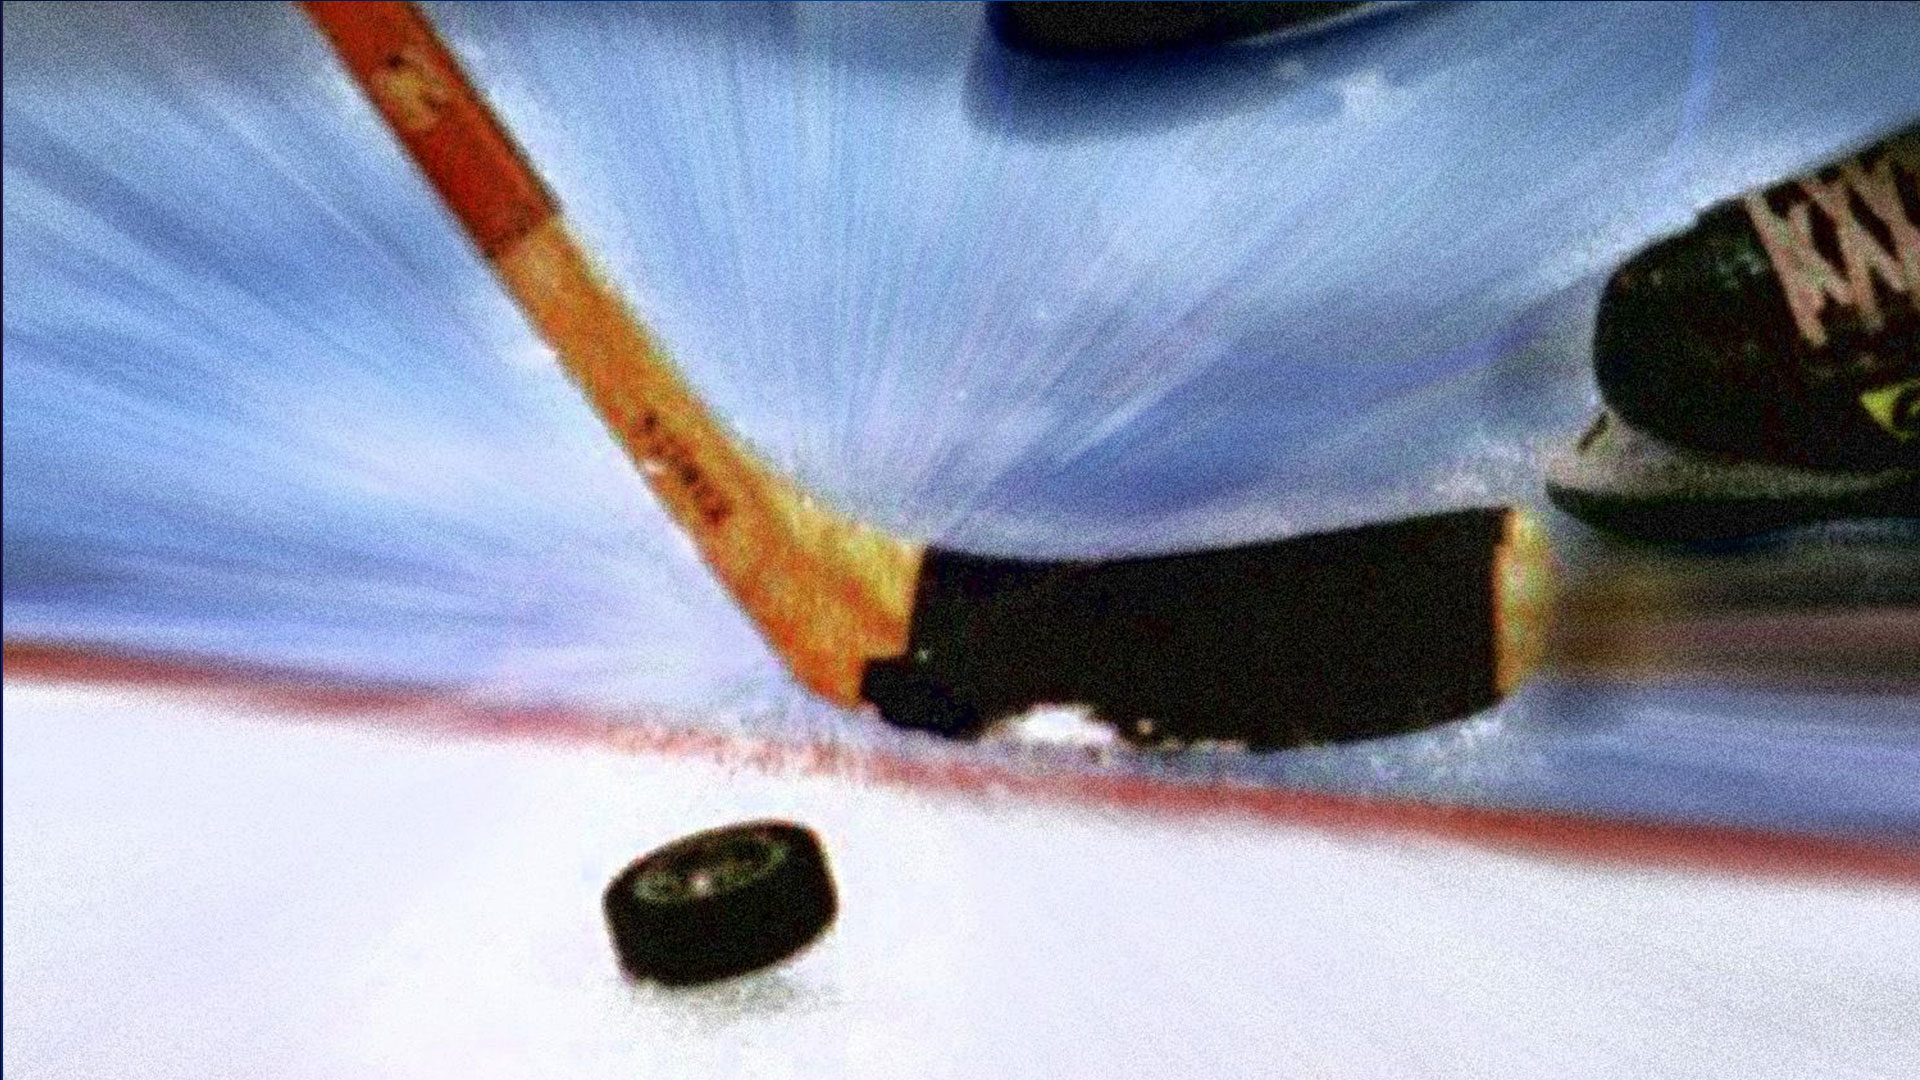 KELO-sports-generic-hockey_1529437987045.jpg